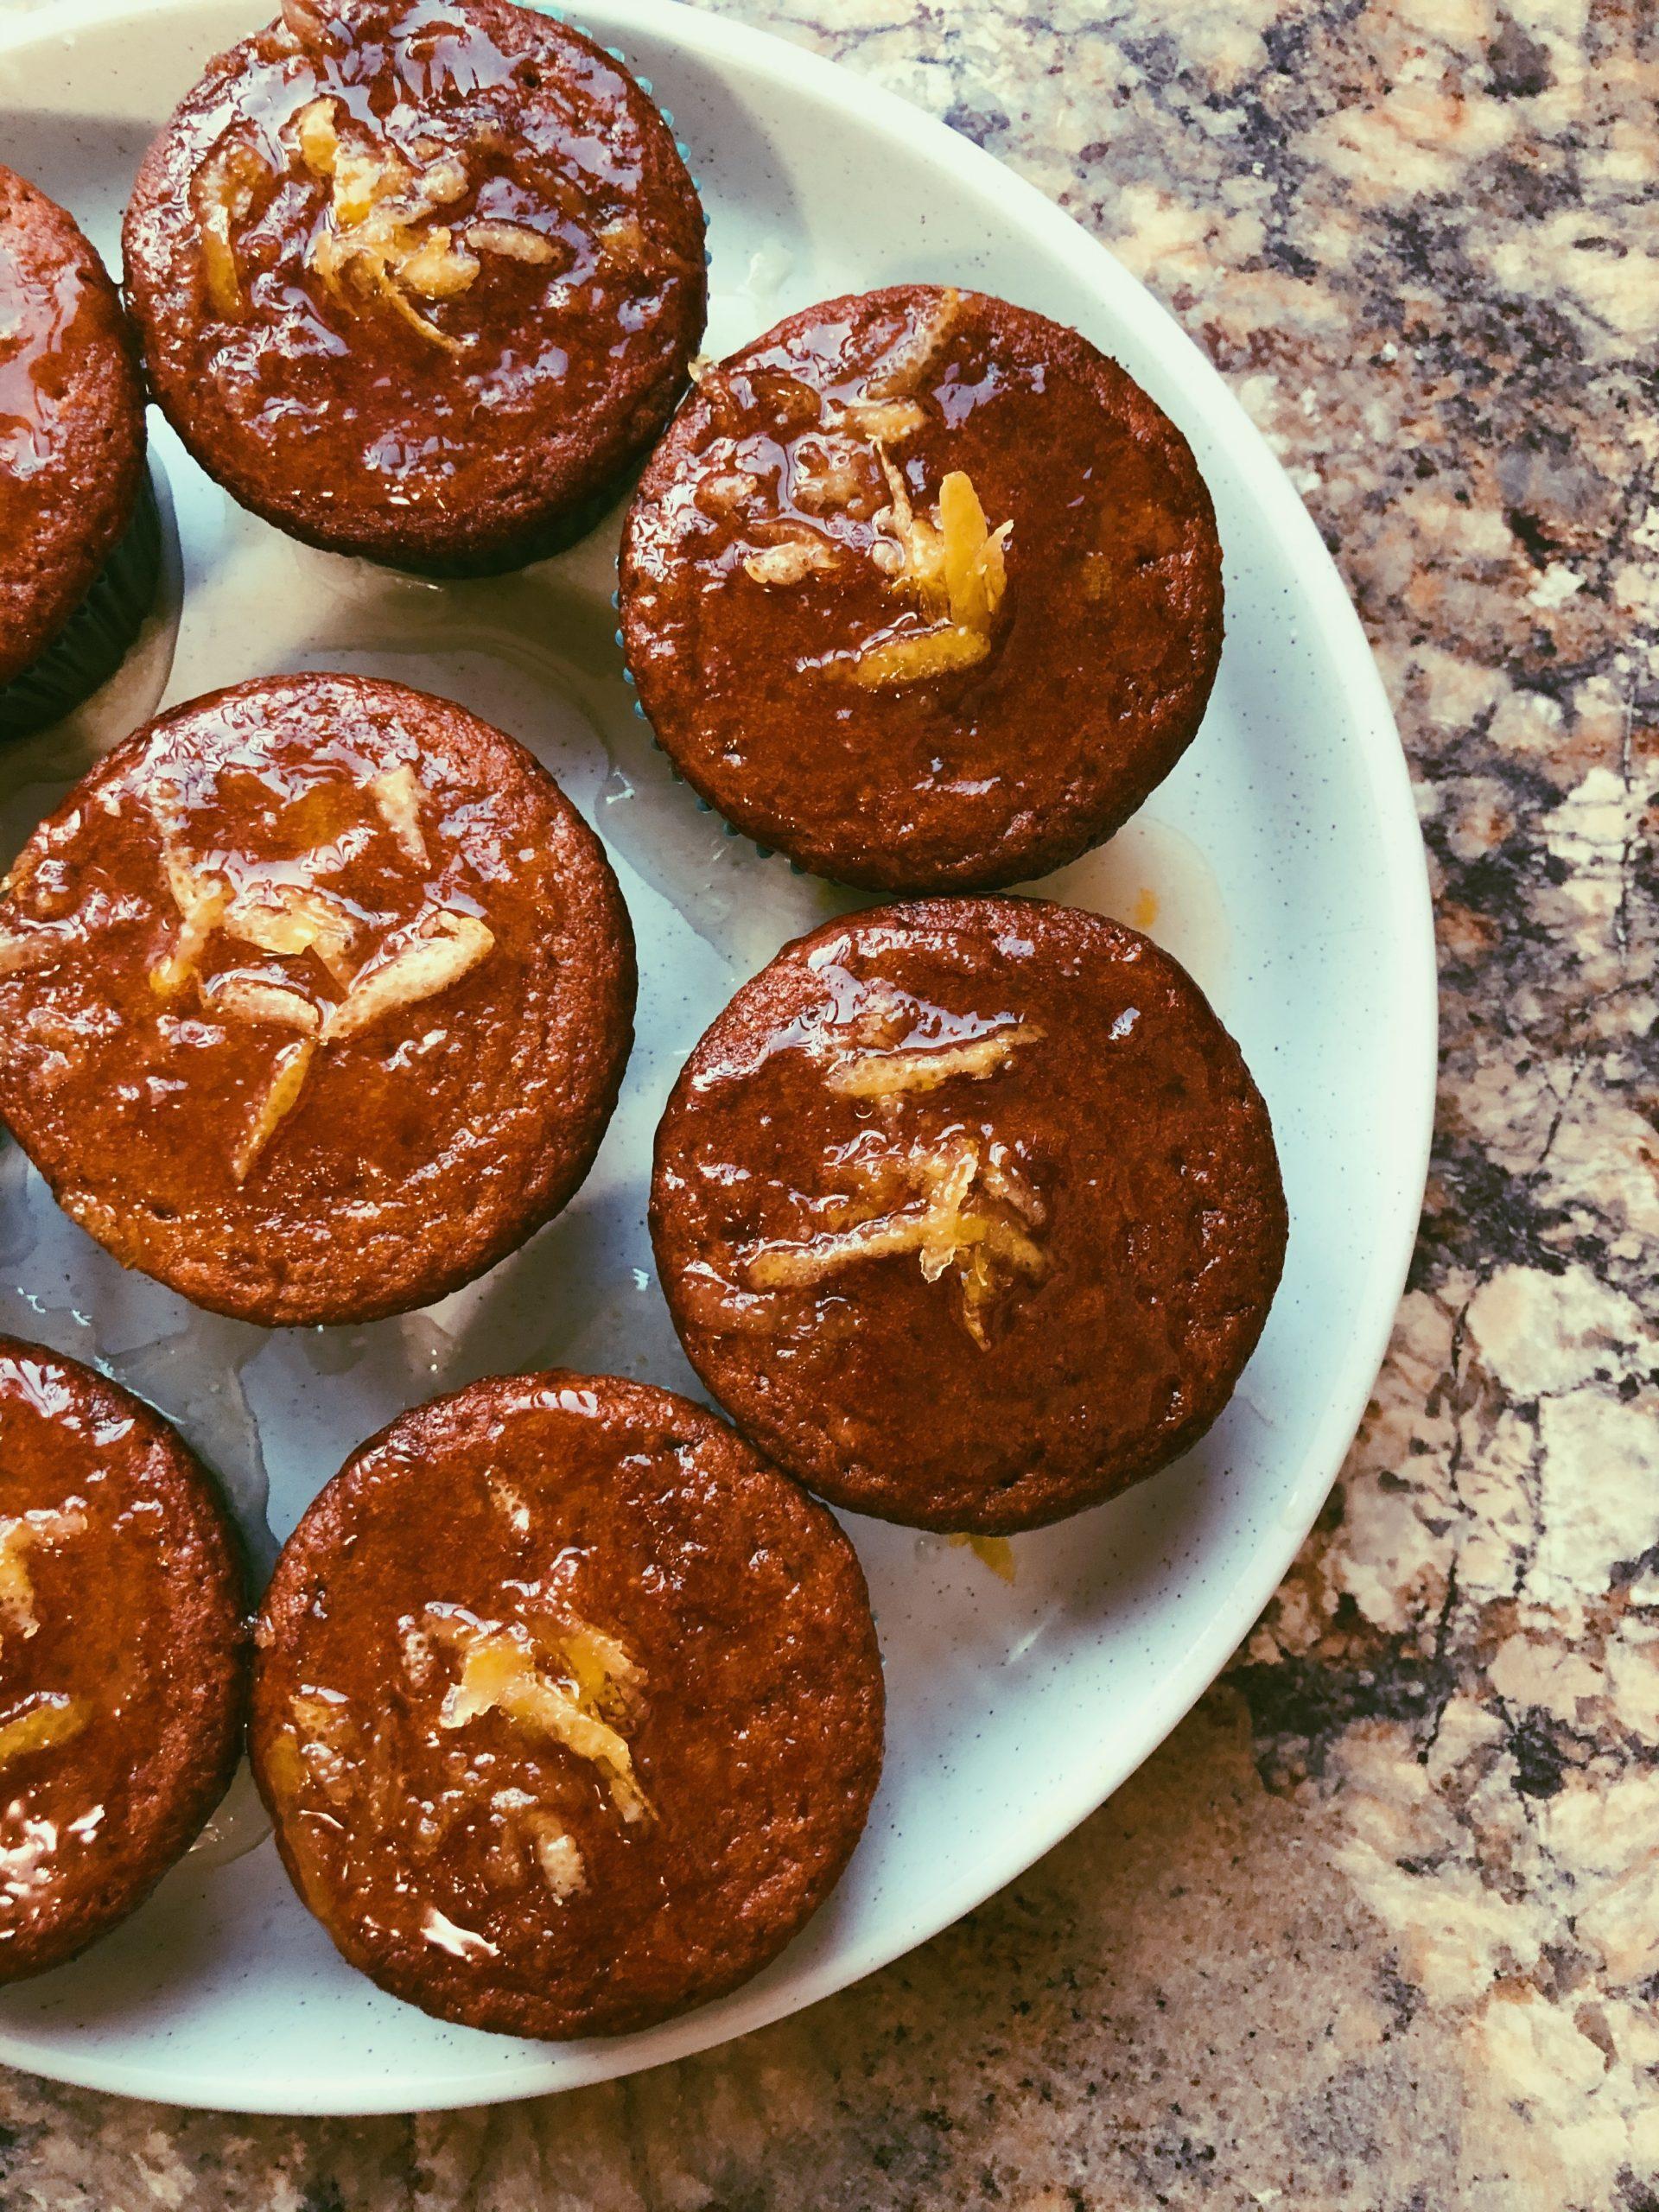 lemon muffins with a lemon honey glaze (grain free, scd diet)